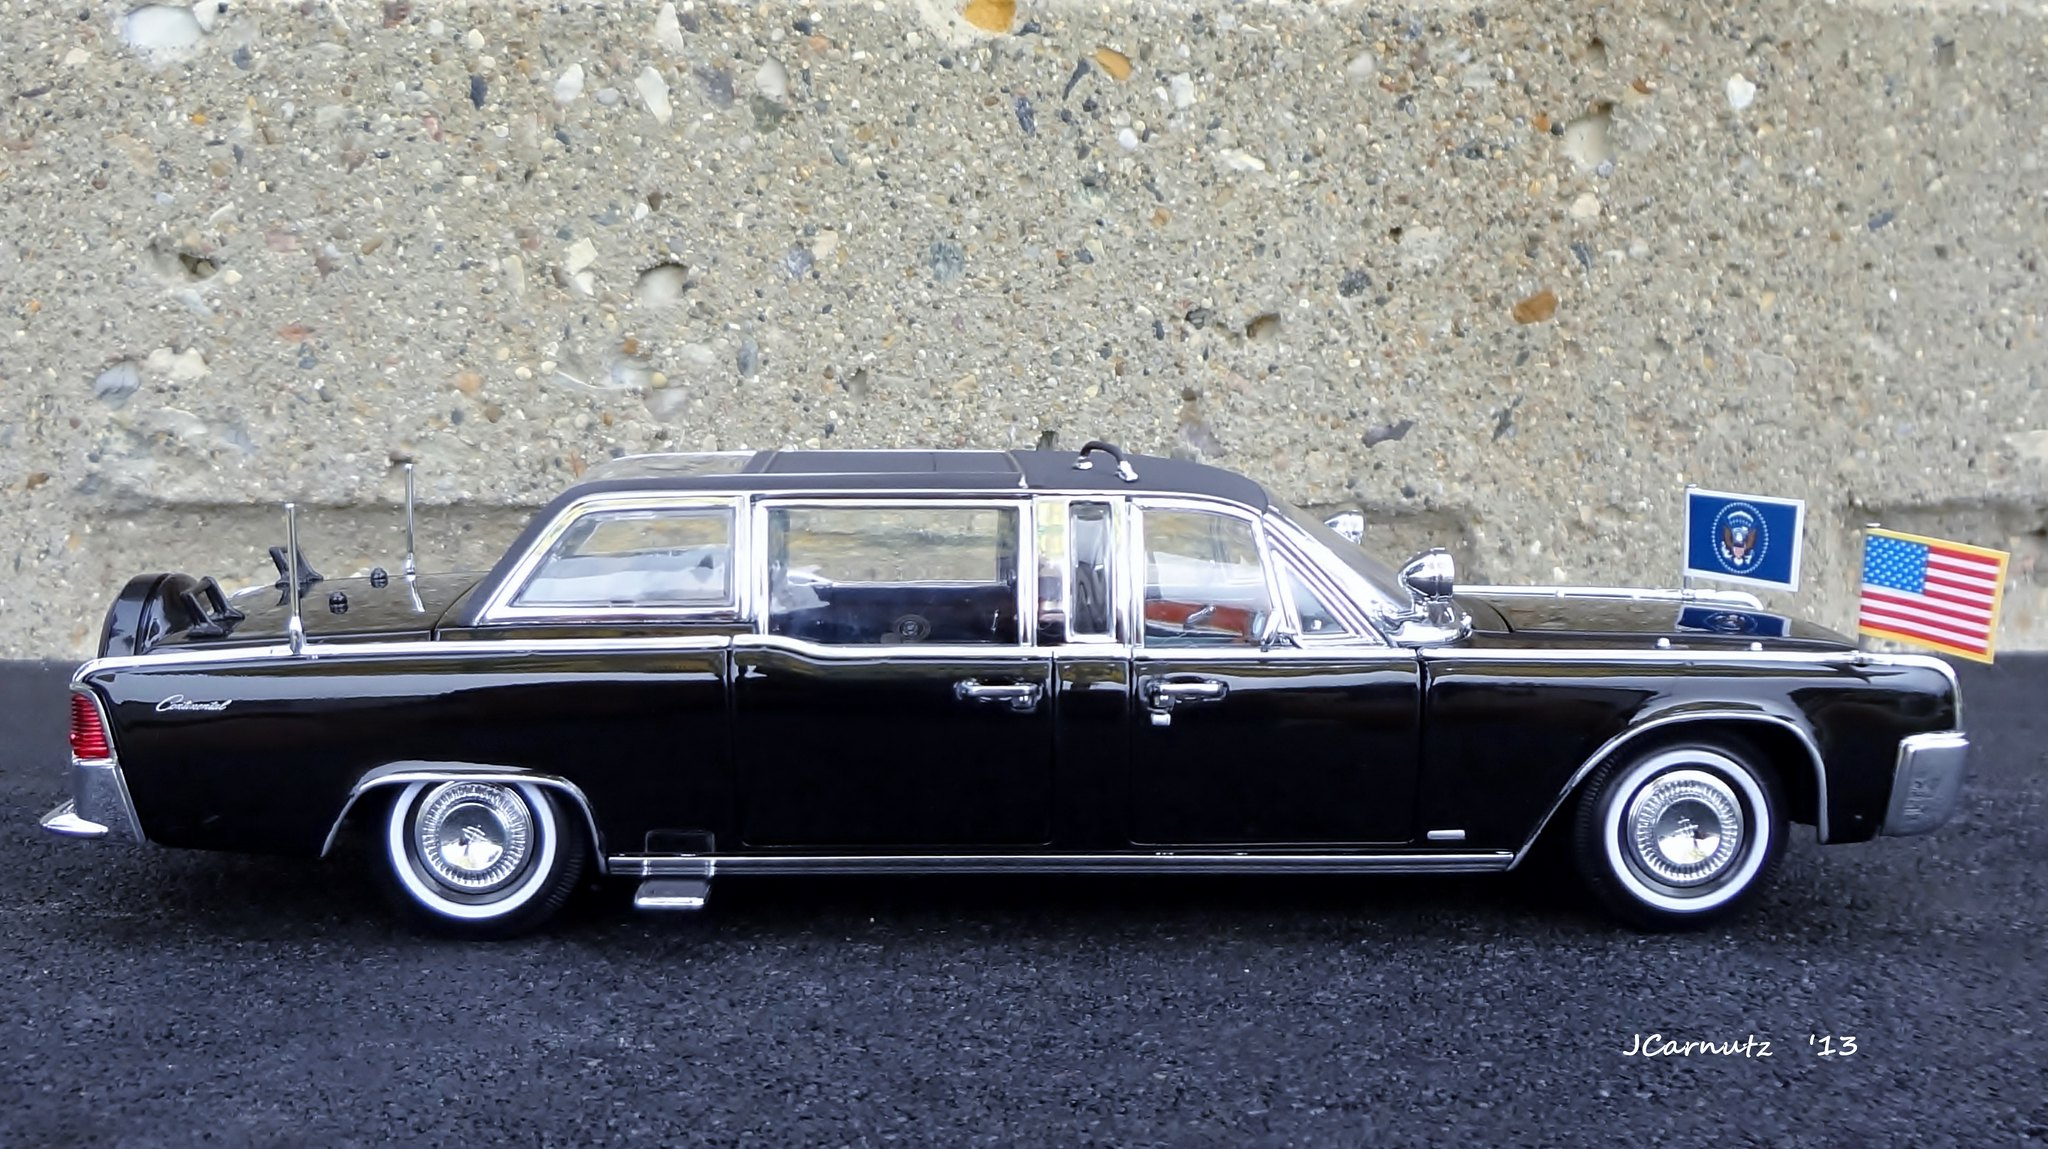 1961 lincoln continental 4dr sedan limousine quick fix version flickr photo sharing. Black Bedroom Furniture Sets. Home Design Ideas